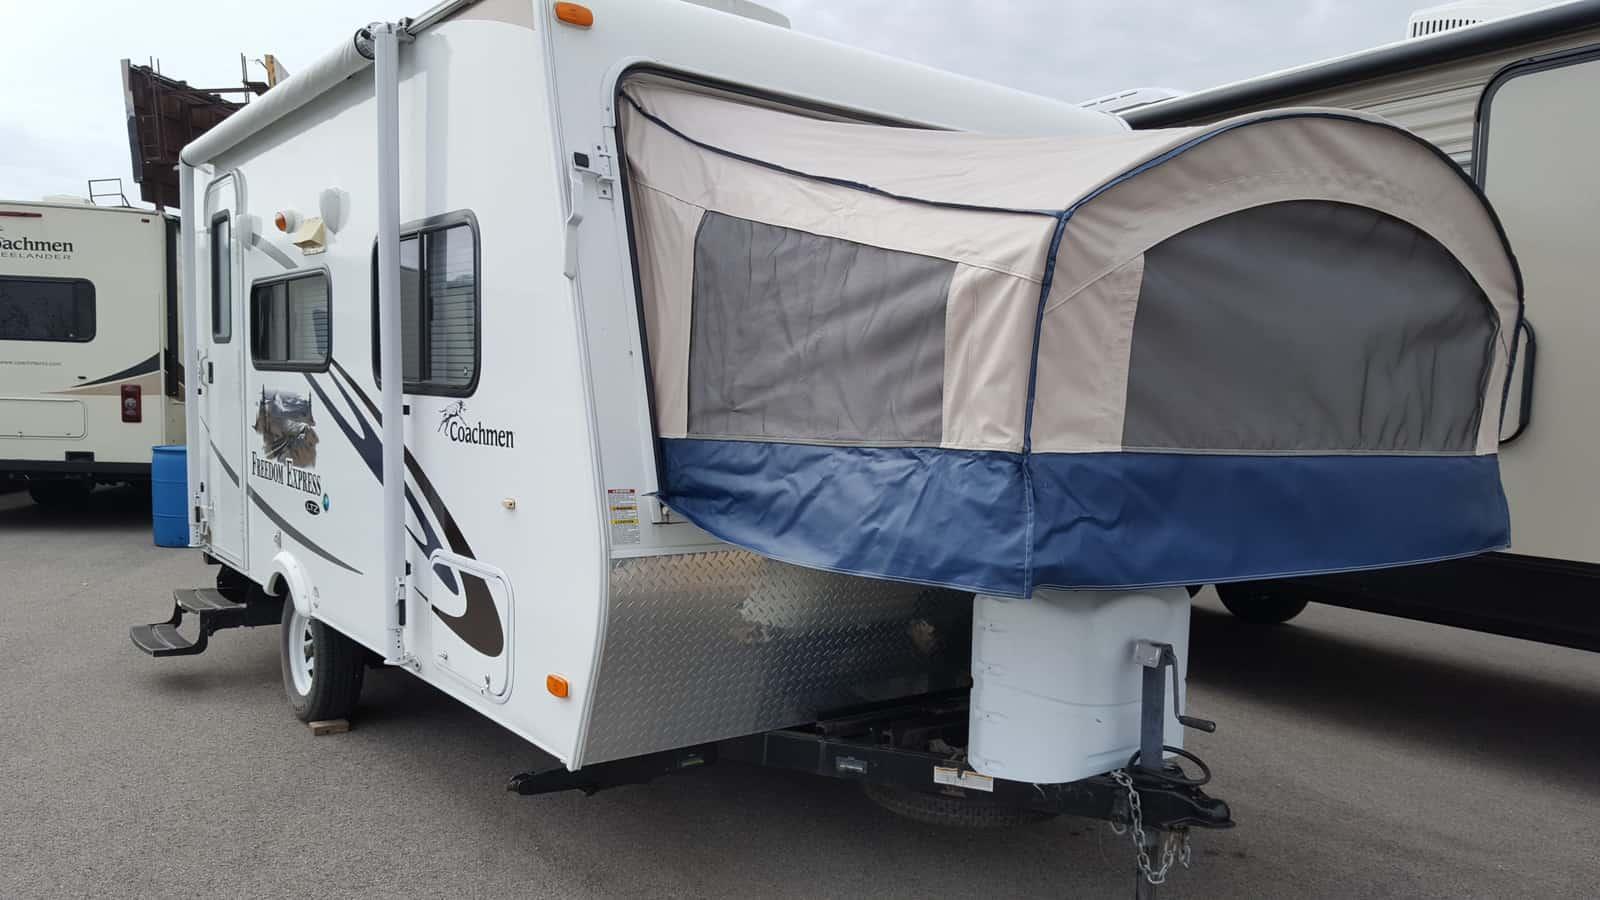 USED 2011 Coachmen FREEDOM EXPRESS 17SDX - American RV